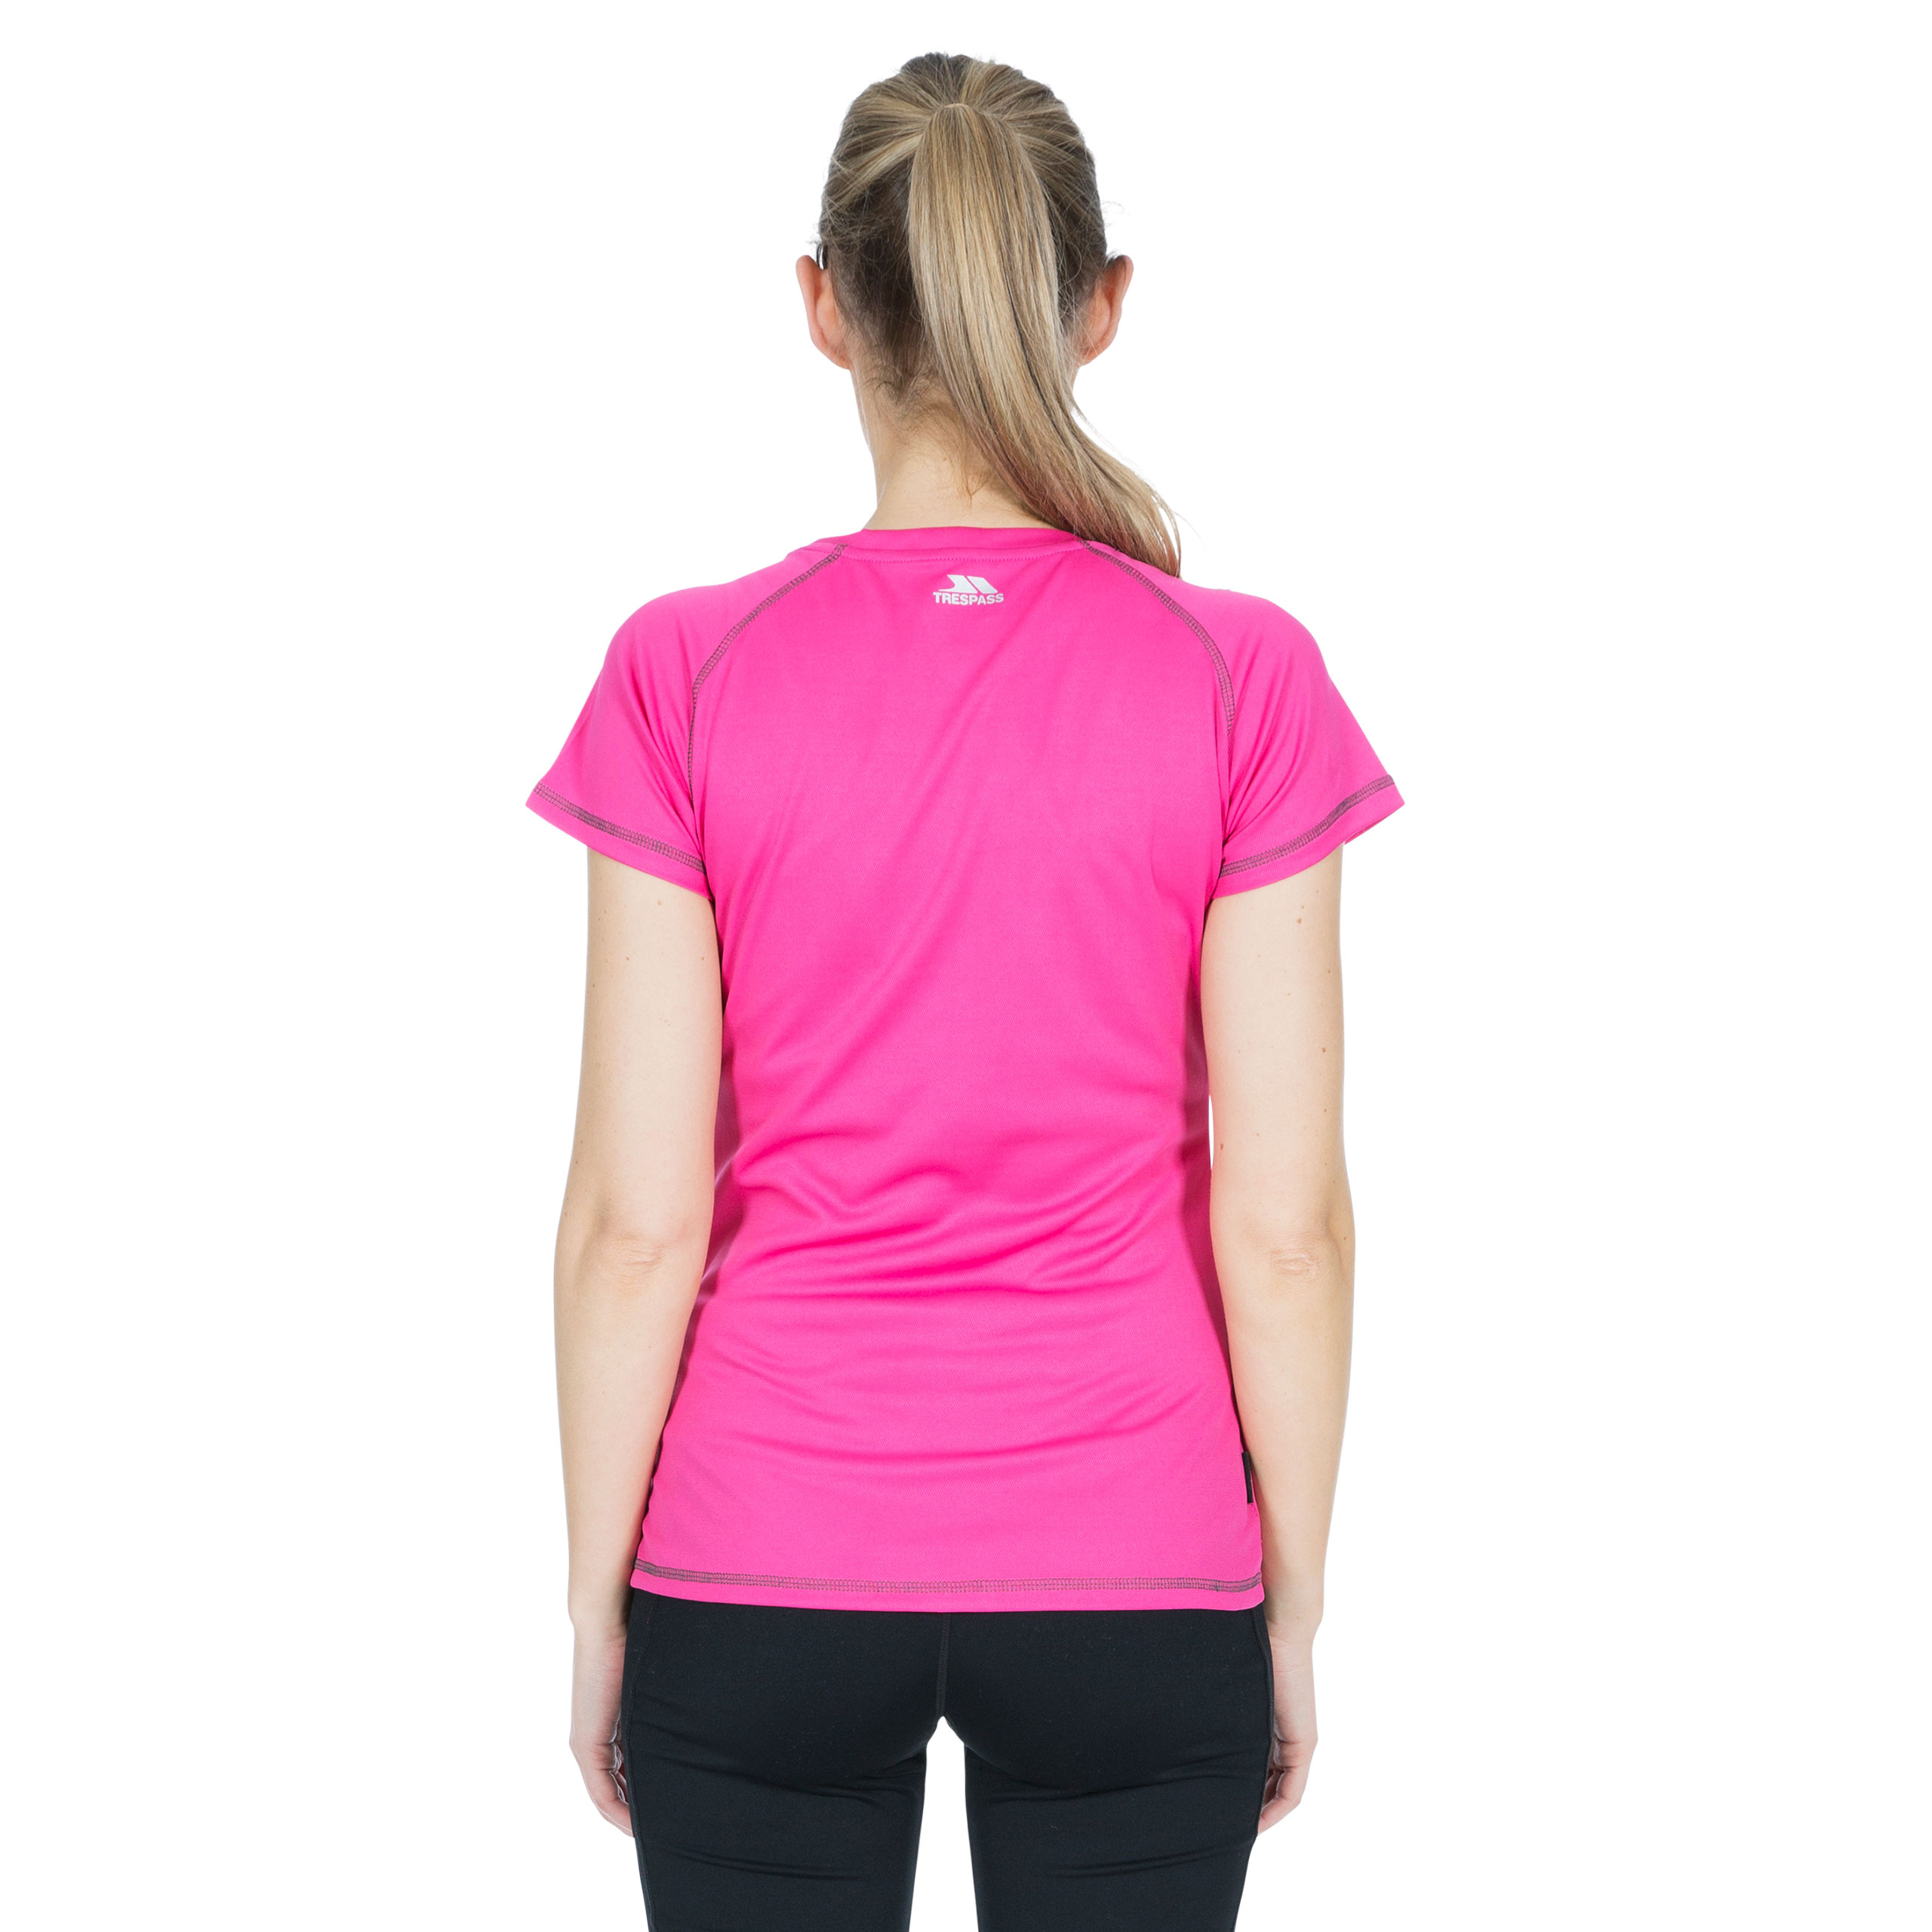 Trespass-Viktoria-Womens-Short-Sleeved-Active-T-Shirt-Gym-Top-For-Ladies thumbnail 20